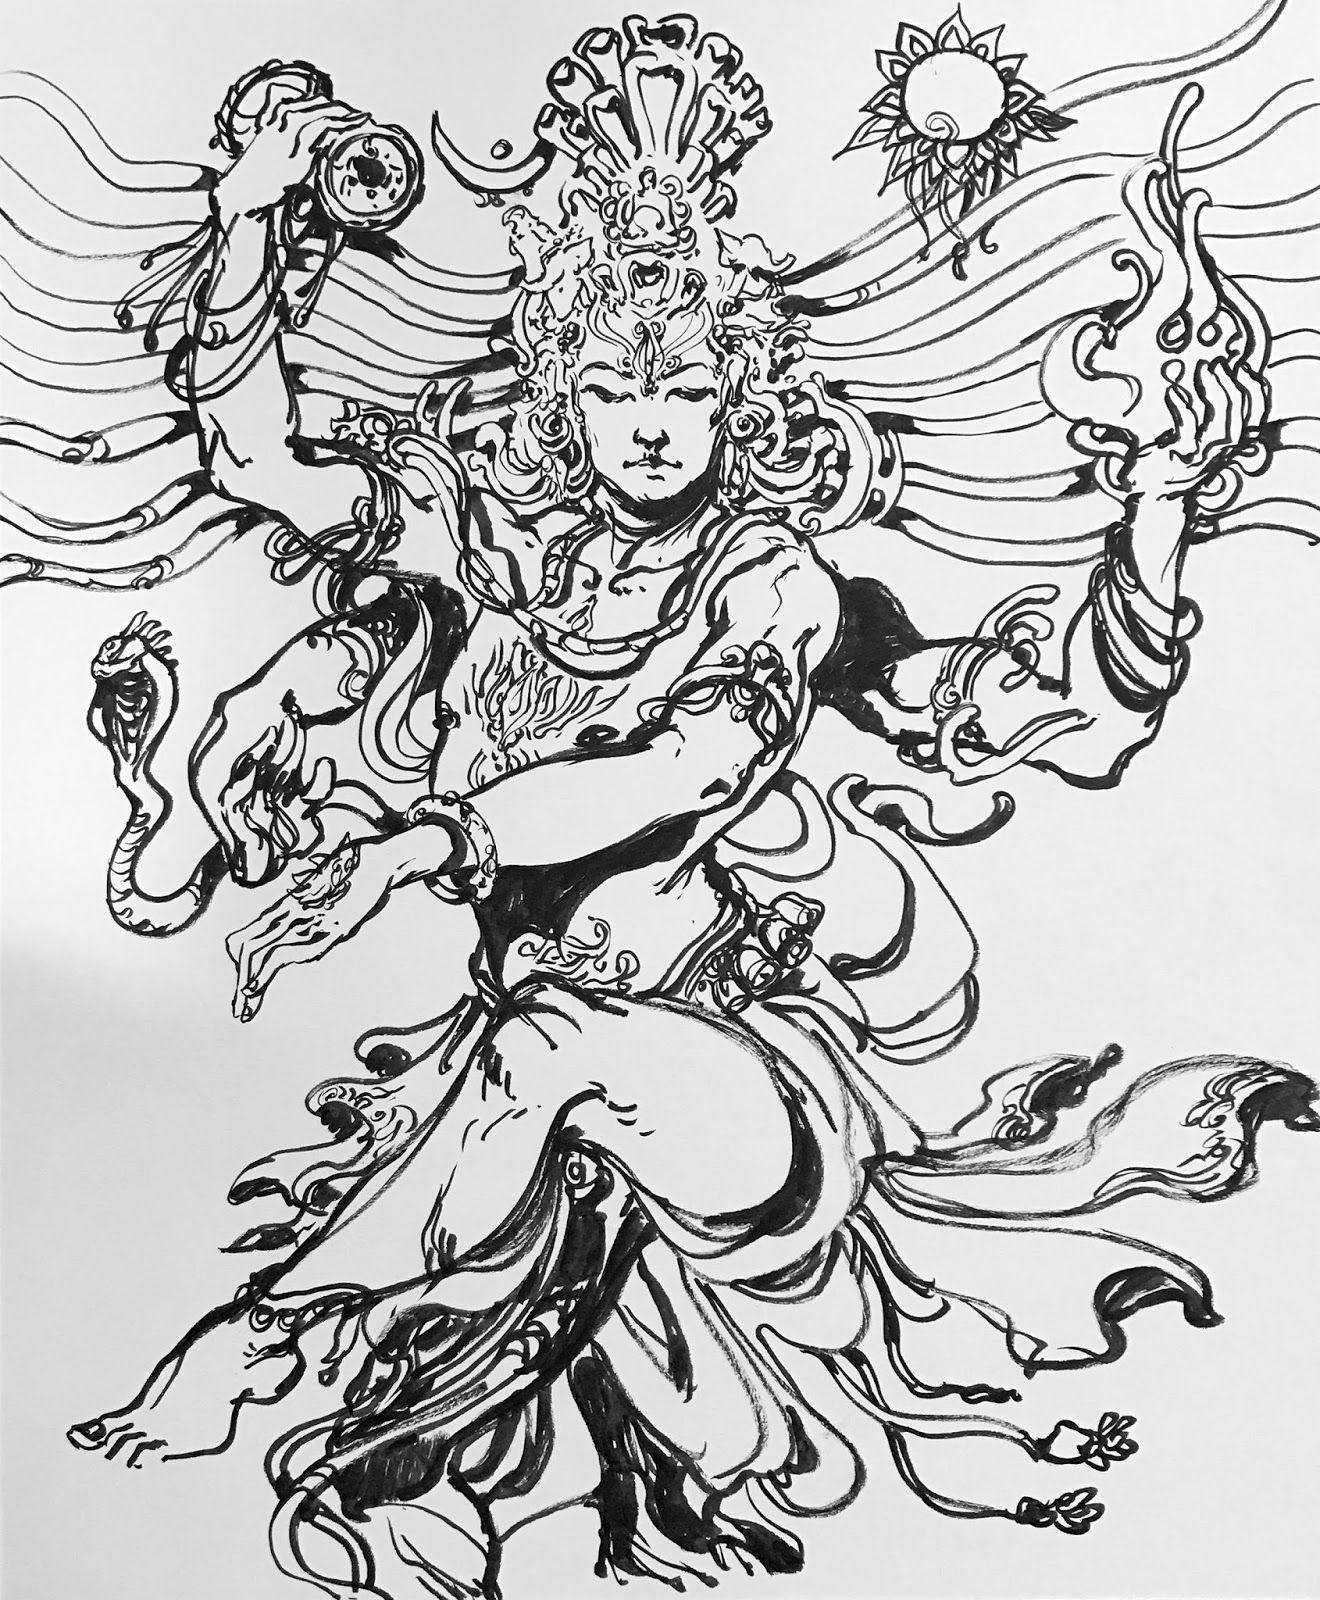 280 Har Har Mahadev Full Hd Photos 1080p Wallpapers Download Free Images 2020 Happy New Year 2020 Images Quotes W Shiva Art Shiva Tattoo Design Shiva Shiva tattoo wallpaper download